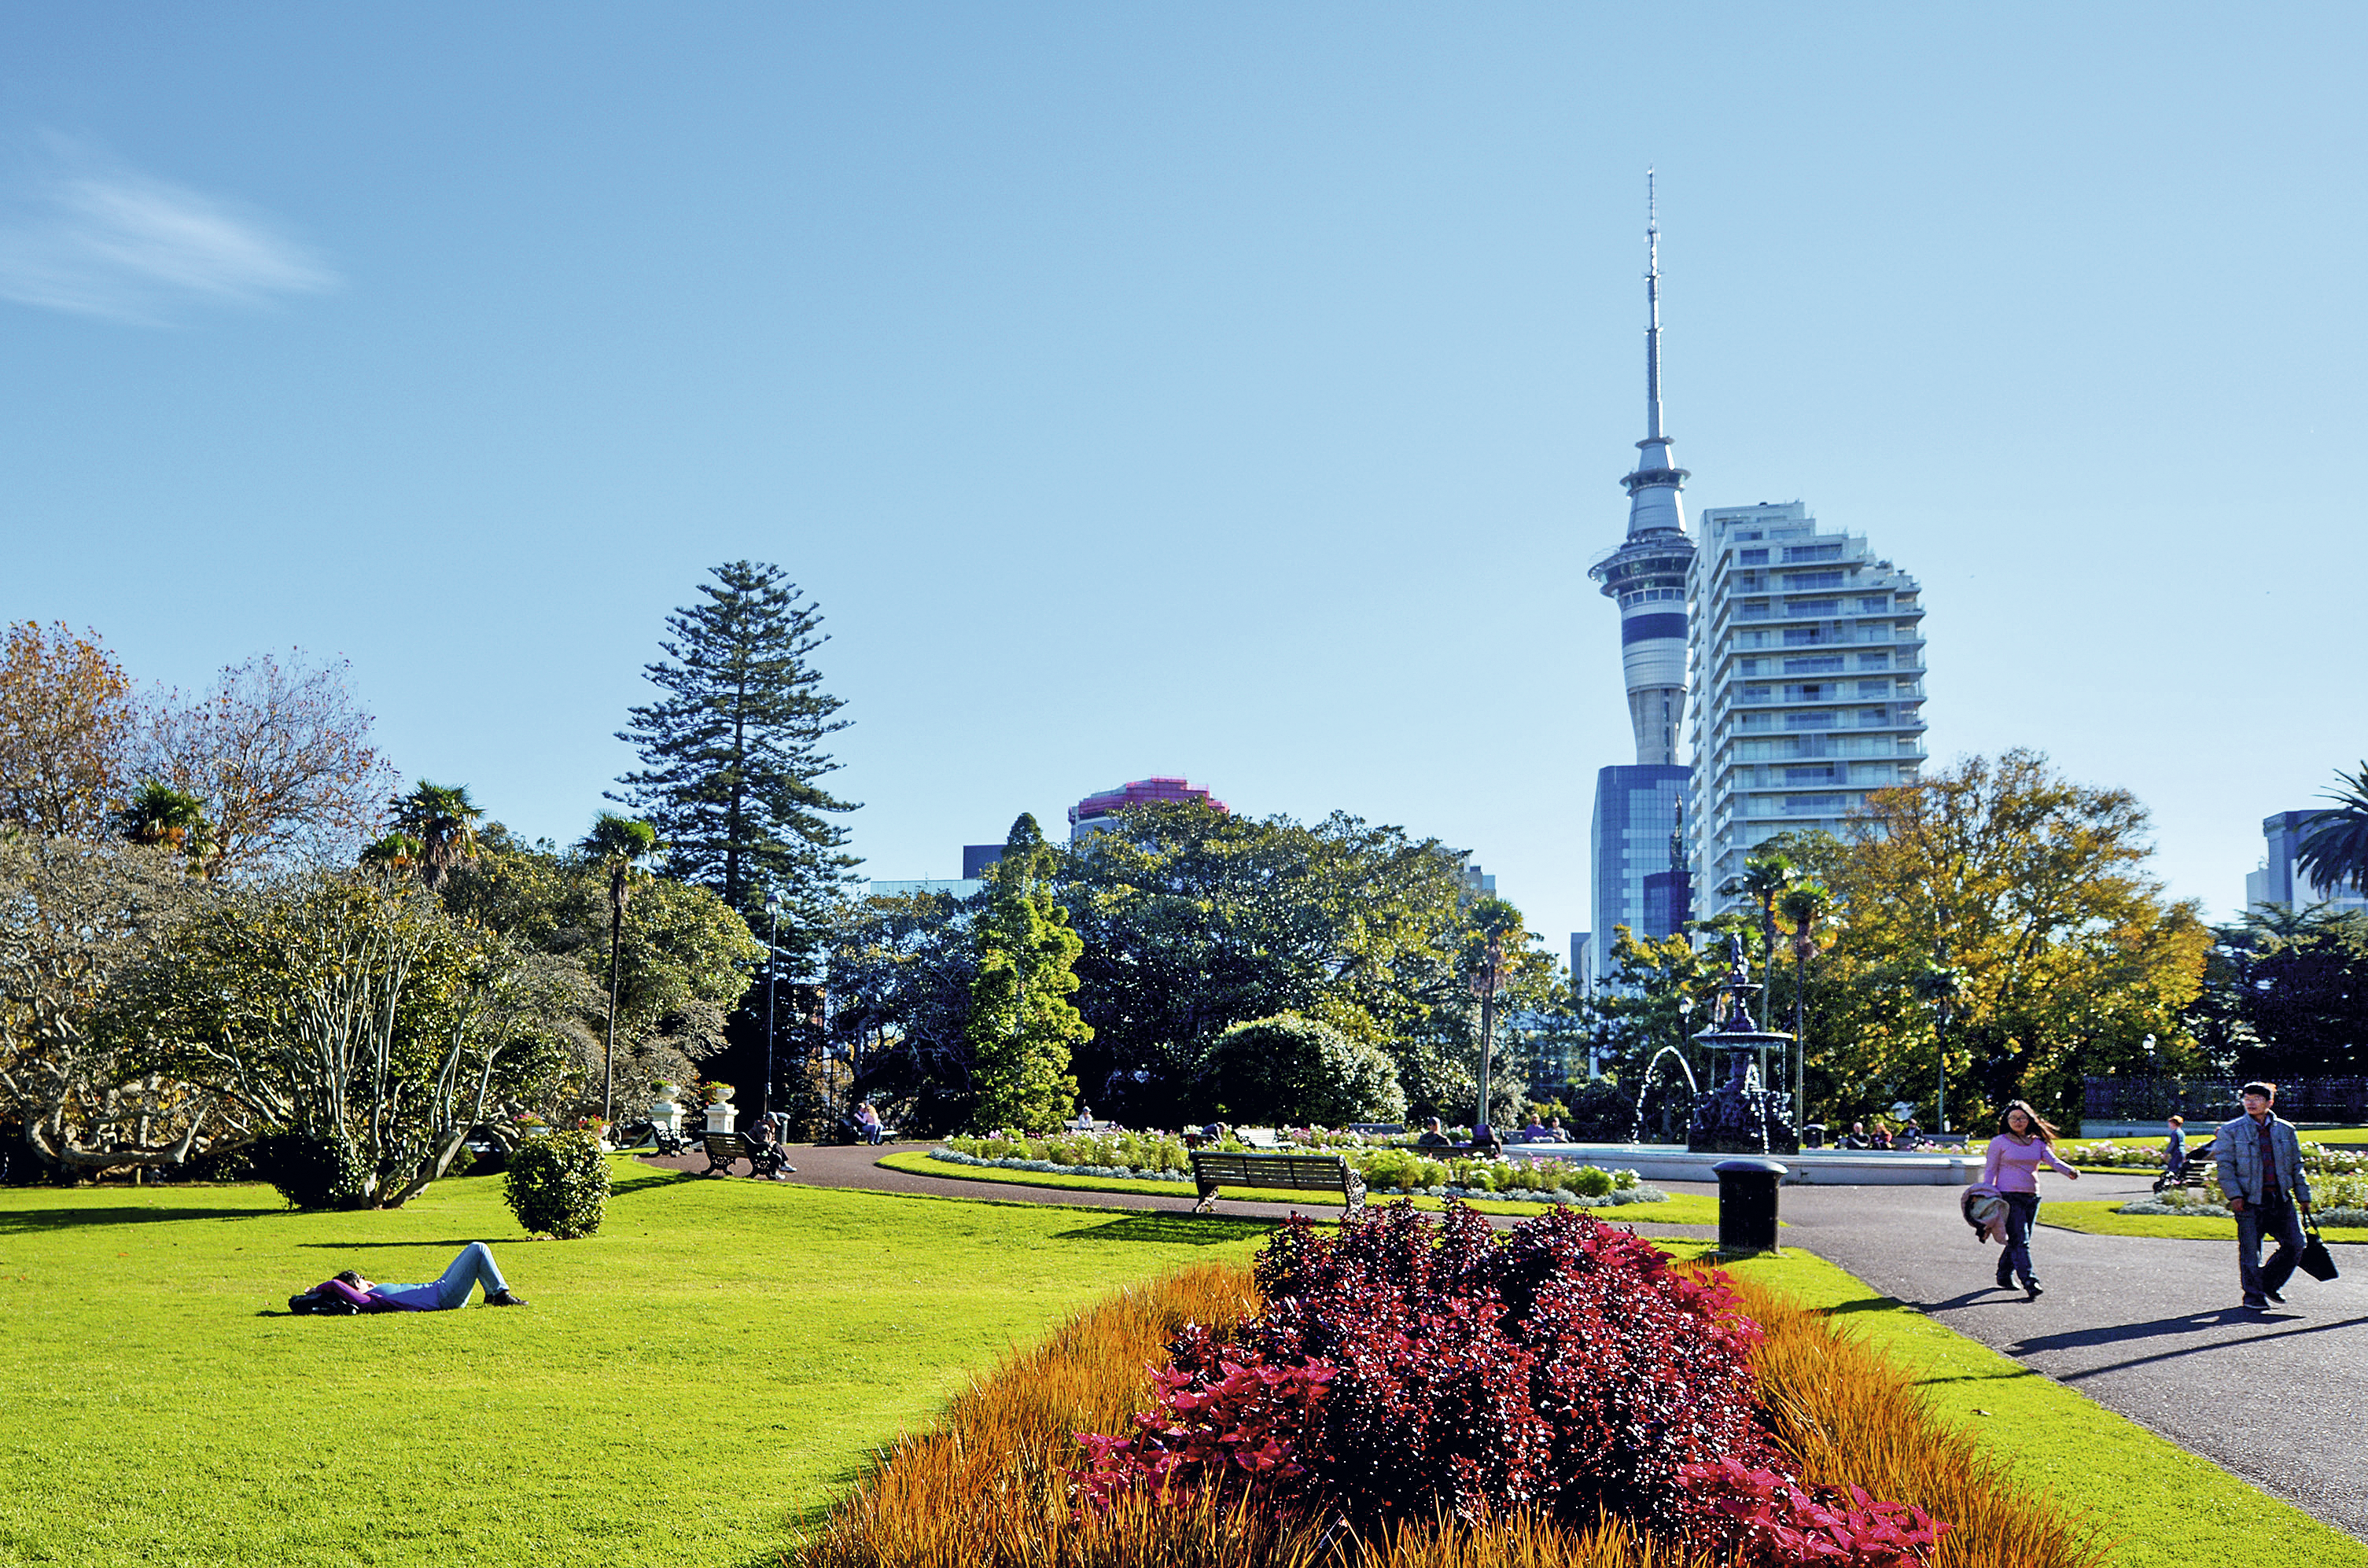 Albert Park, Auckland, Nova Zelândia